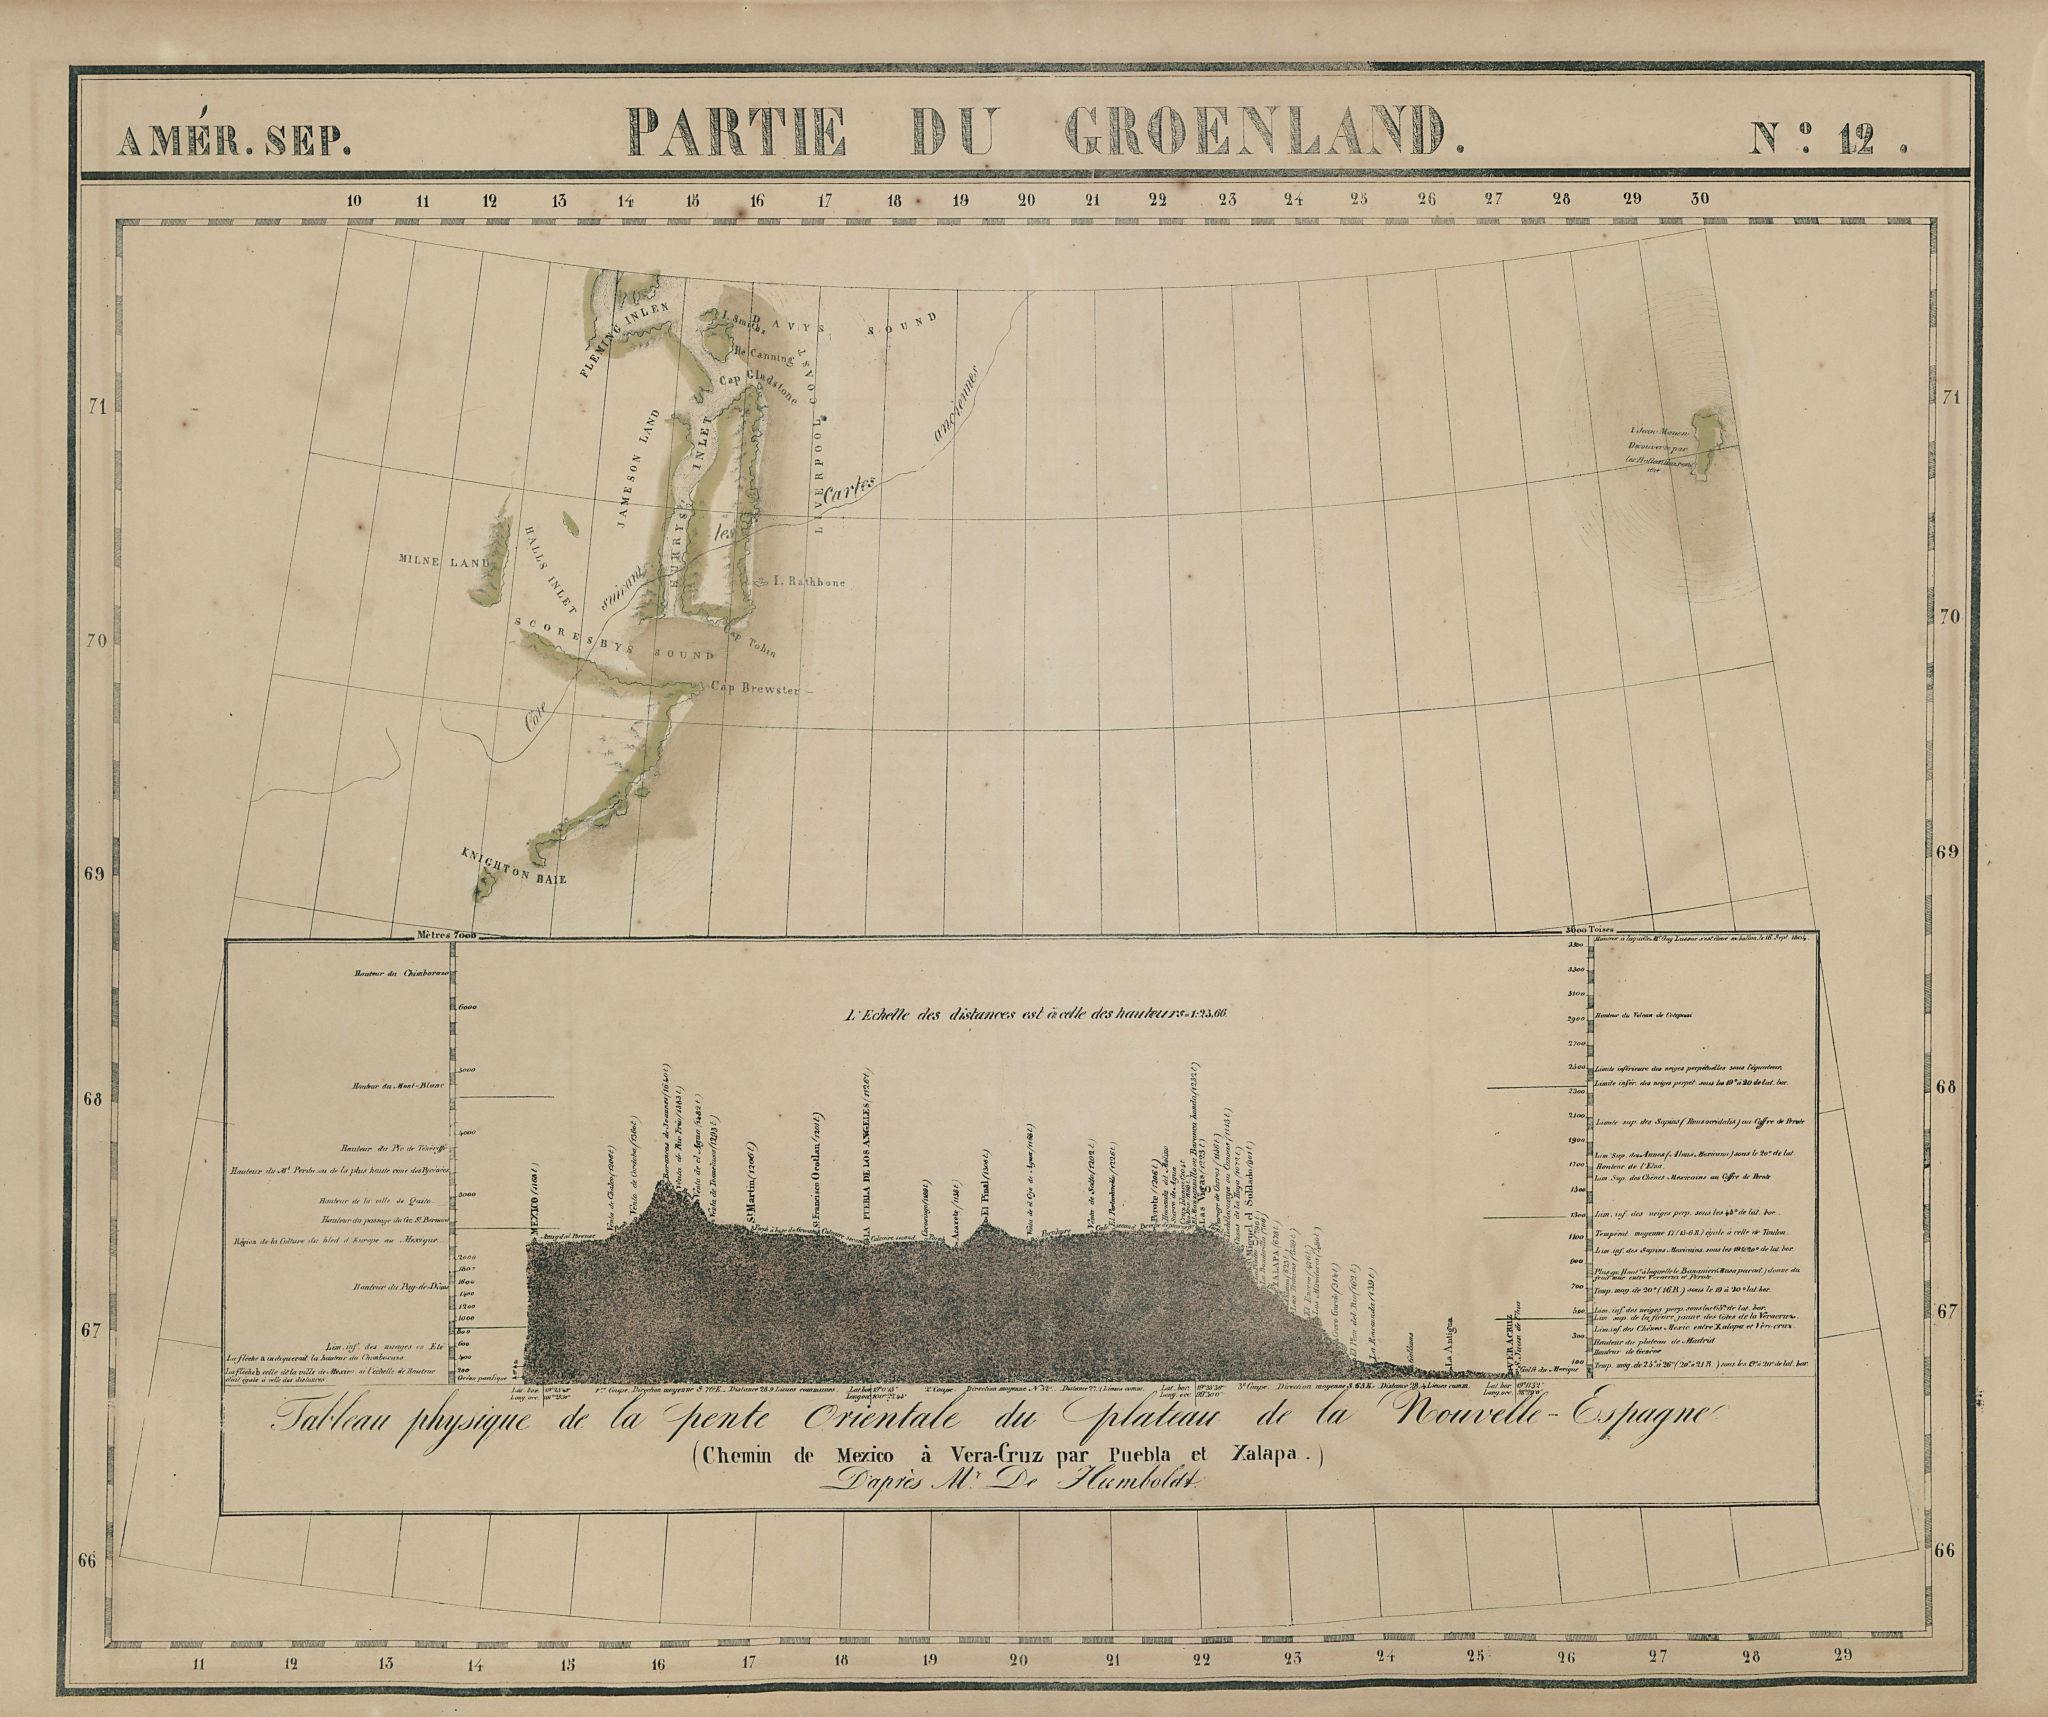 Amér Sep. Partie du Groenland #12 Greenland Mexico profile VANDERMAELEN 1827 map